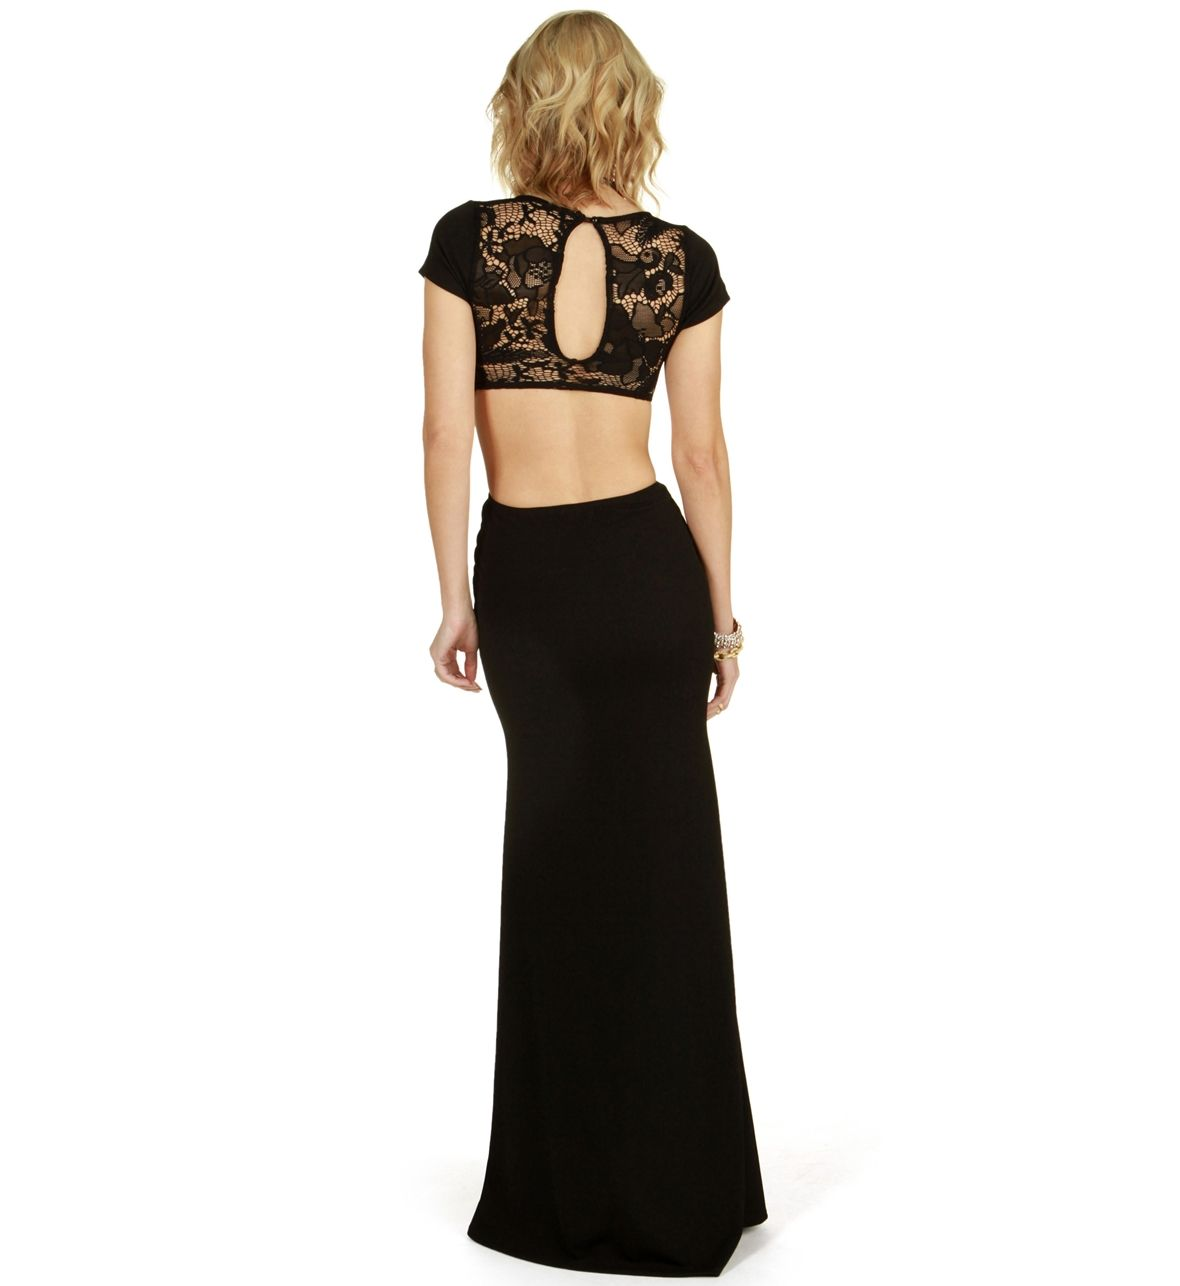 Fine Windsor Store Prom Dresses Image - Colorful Wedding Dress Ideas ...